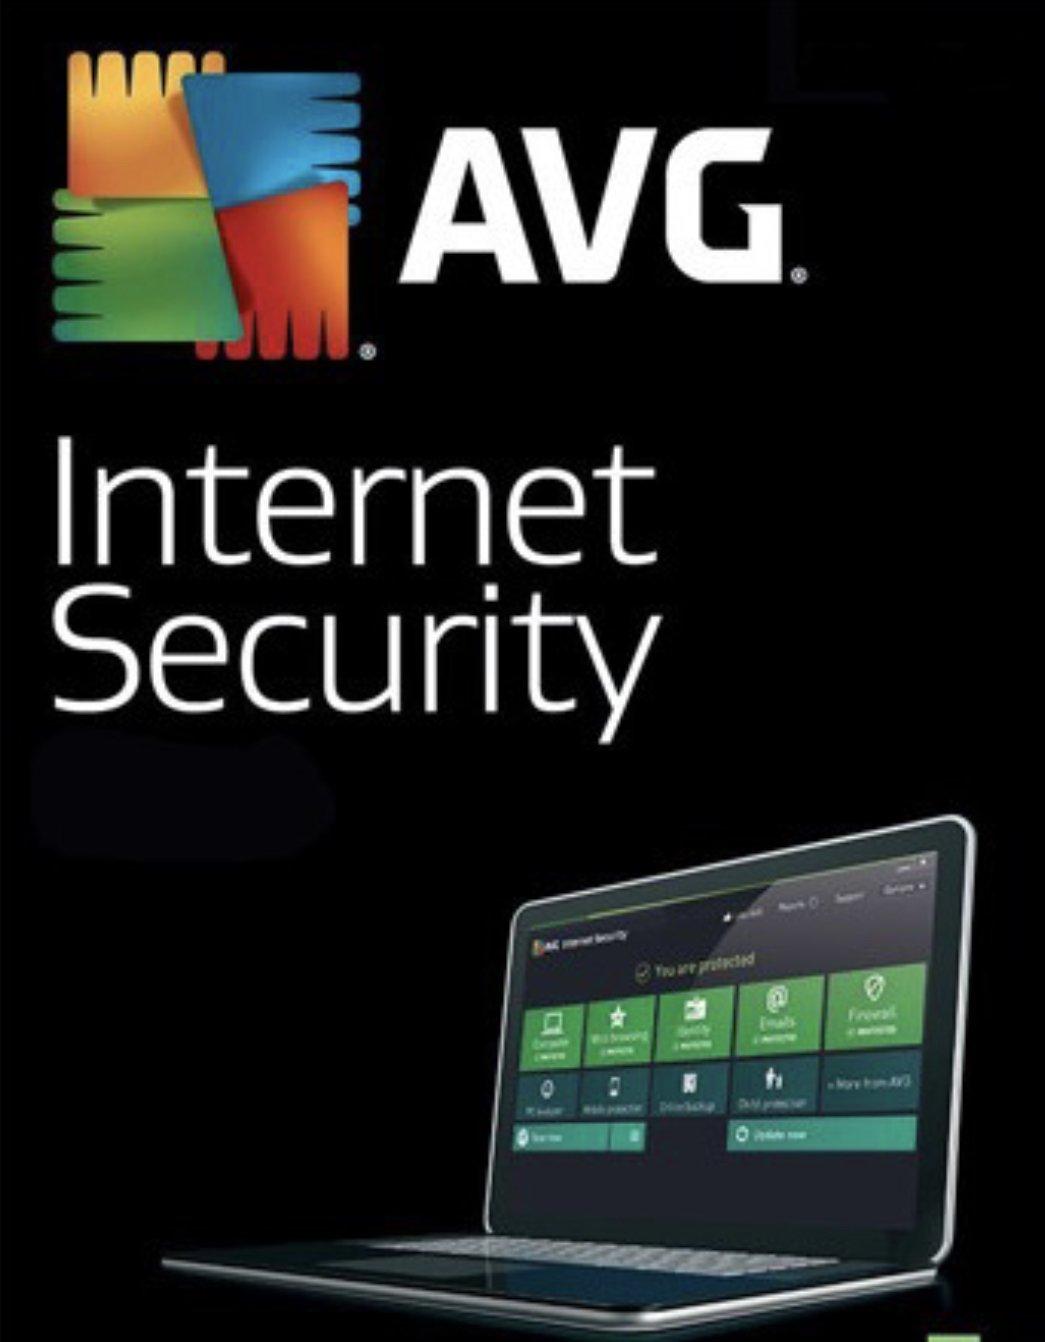 Read carefully AVG Antivirus Internet Security 1 year 1 pc